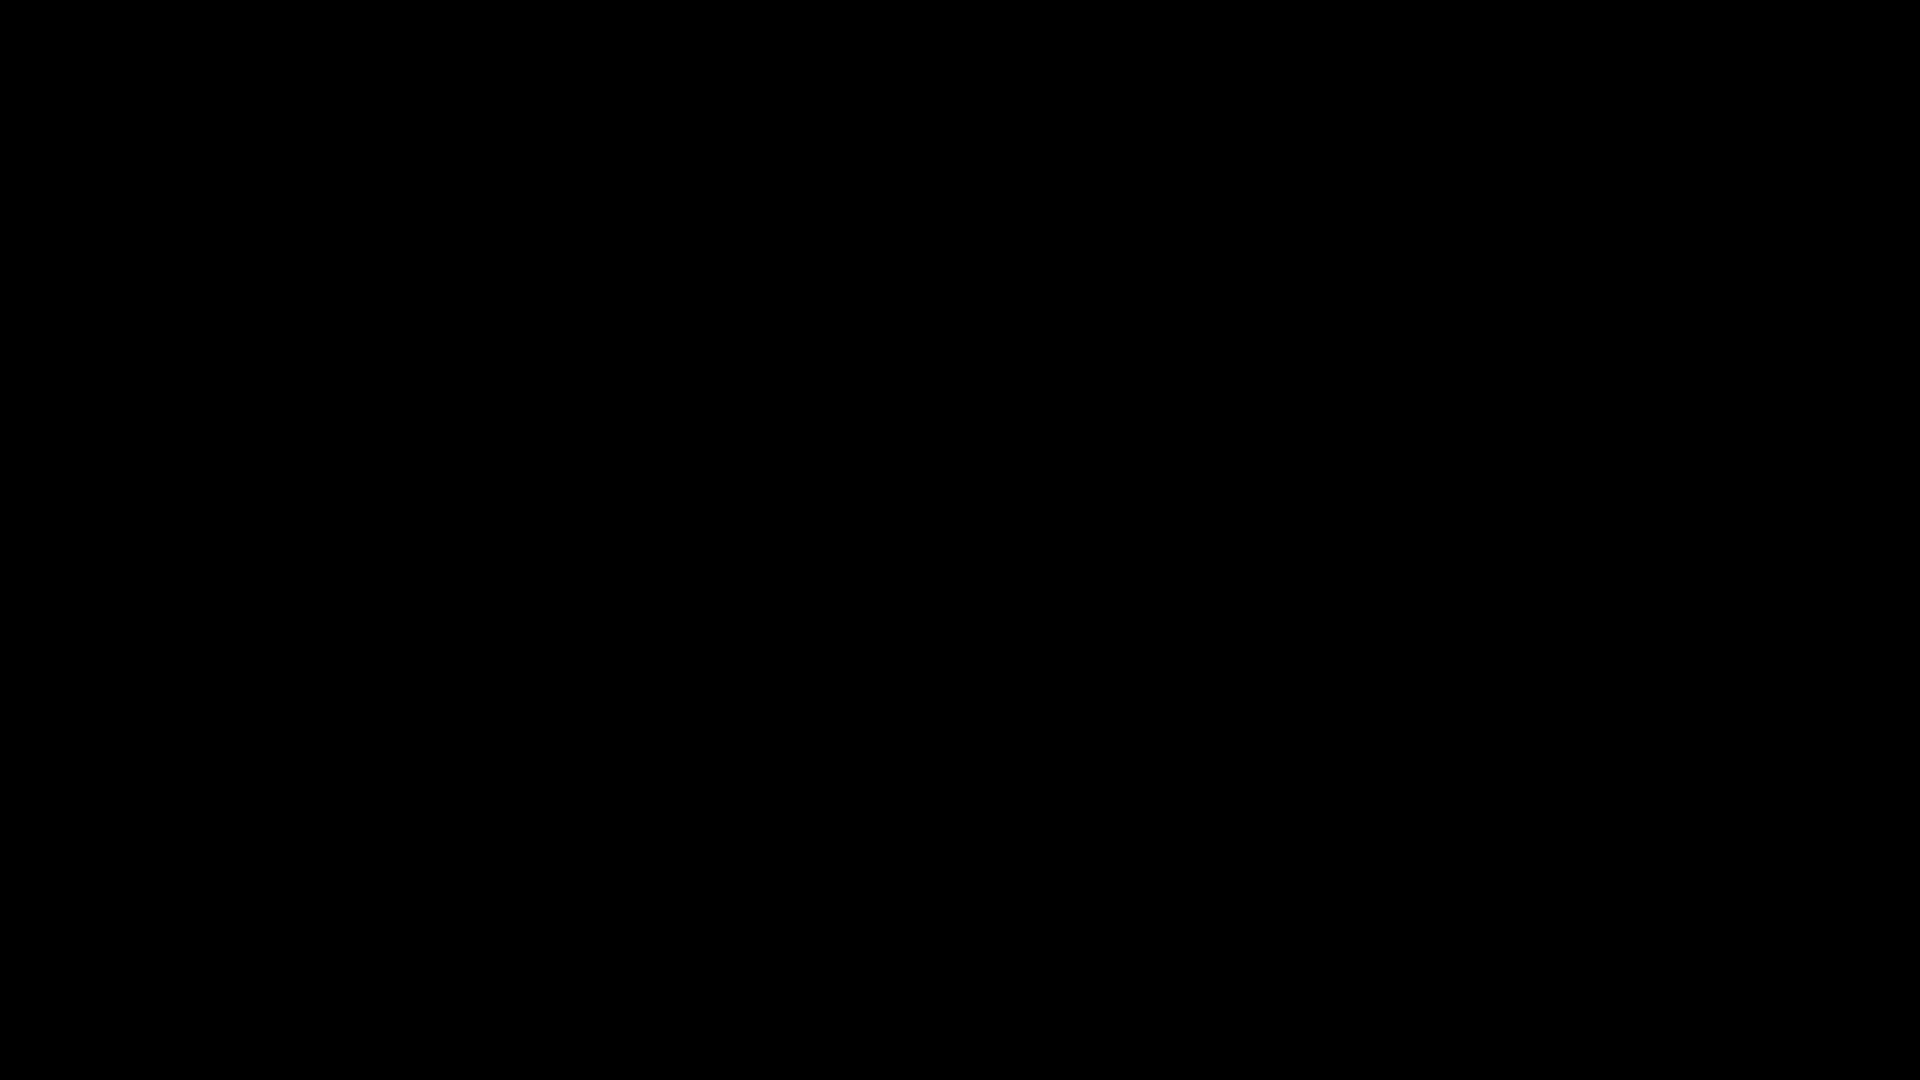 amy, for kids, kids, knuckles, love, love potion, love potion used on sonic, minecraft, minecraft sonic, potion, rouge, sonamy, sonic, sonic and amy, sonic the hedgehog, sonic the hedgehog movie, tails, tripolar, tripolar minecraft, Minecraft Sonic The Hedgehog - Love Potion Used On Sonic! [31] GIFs